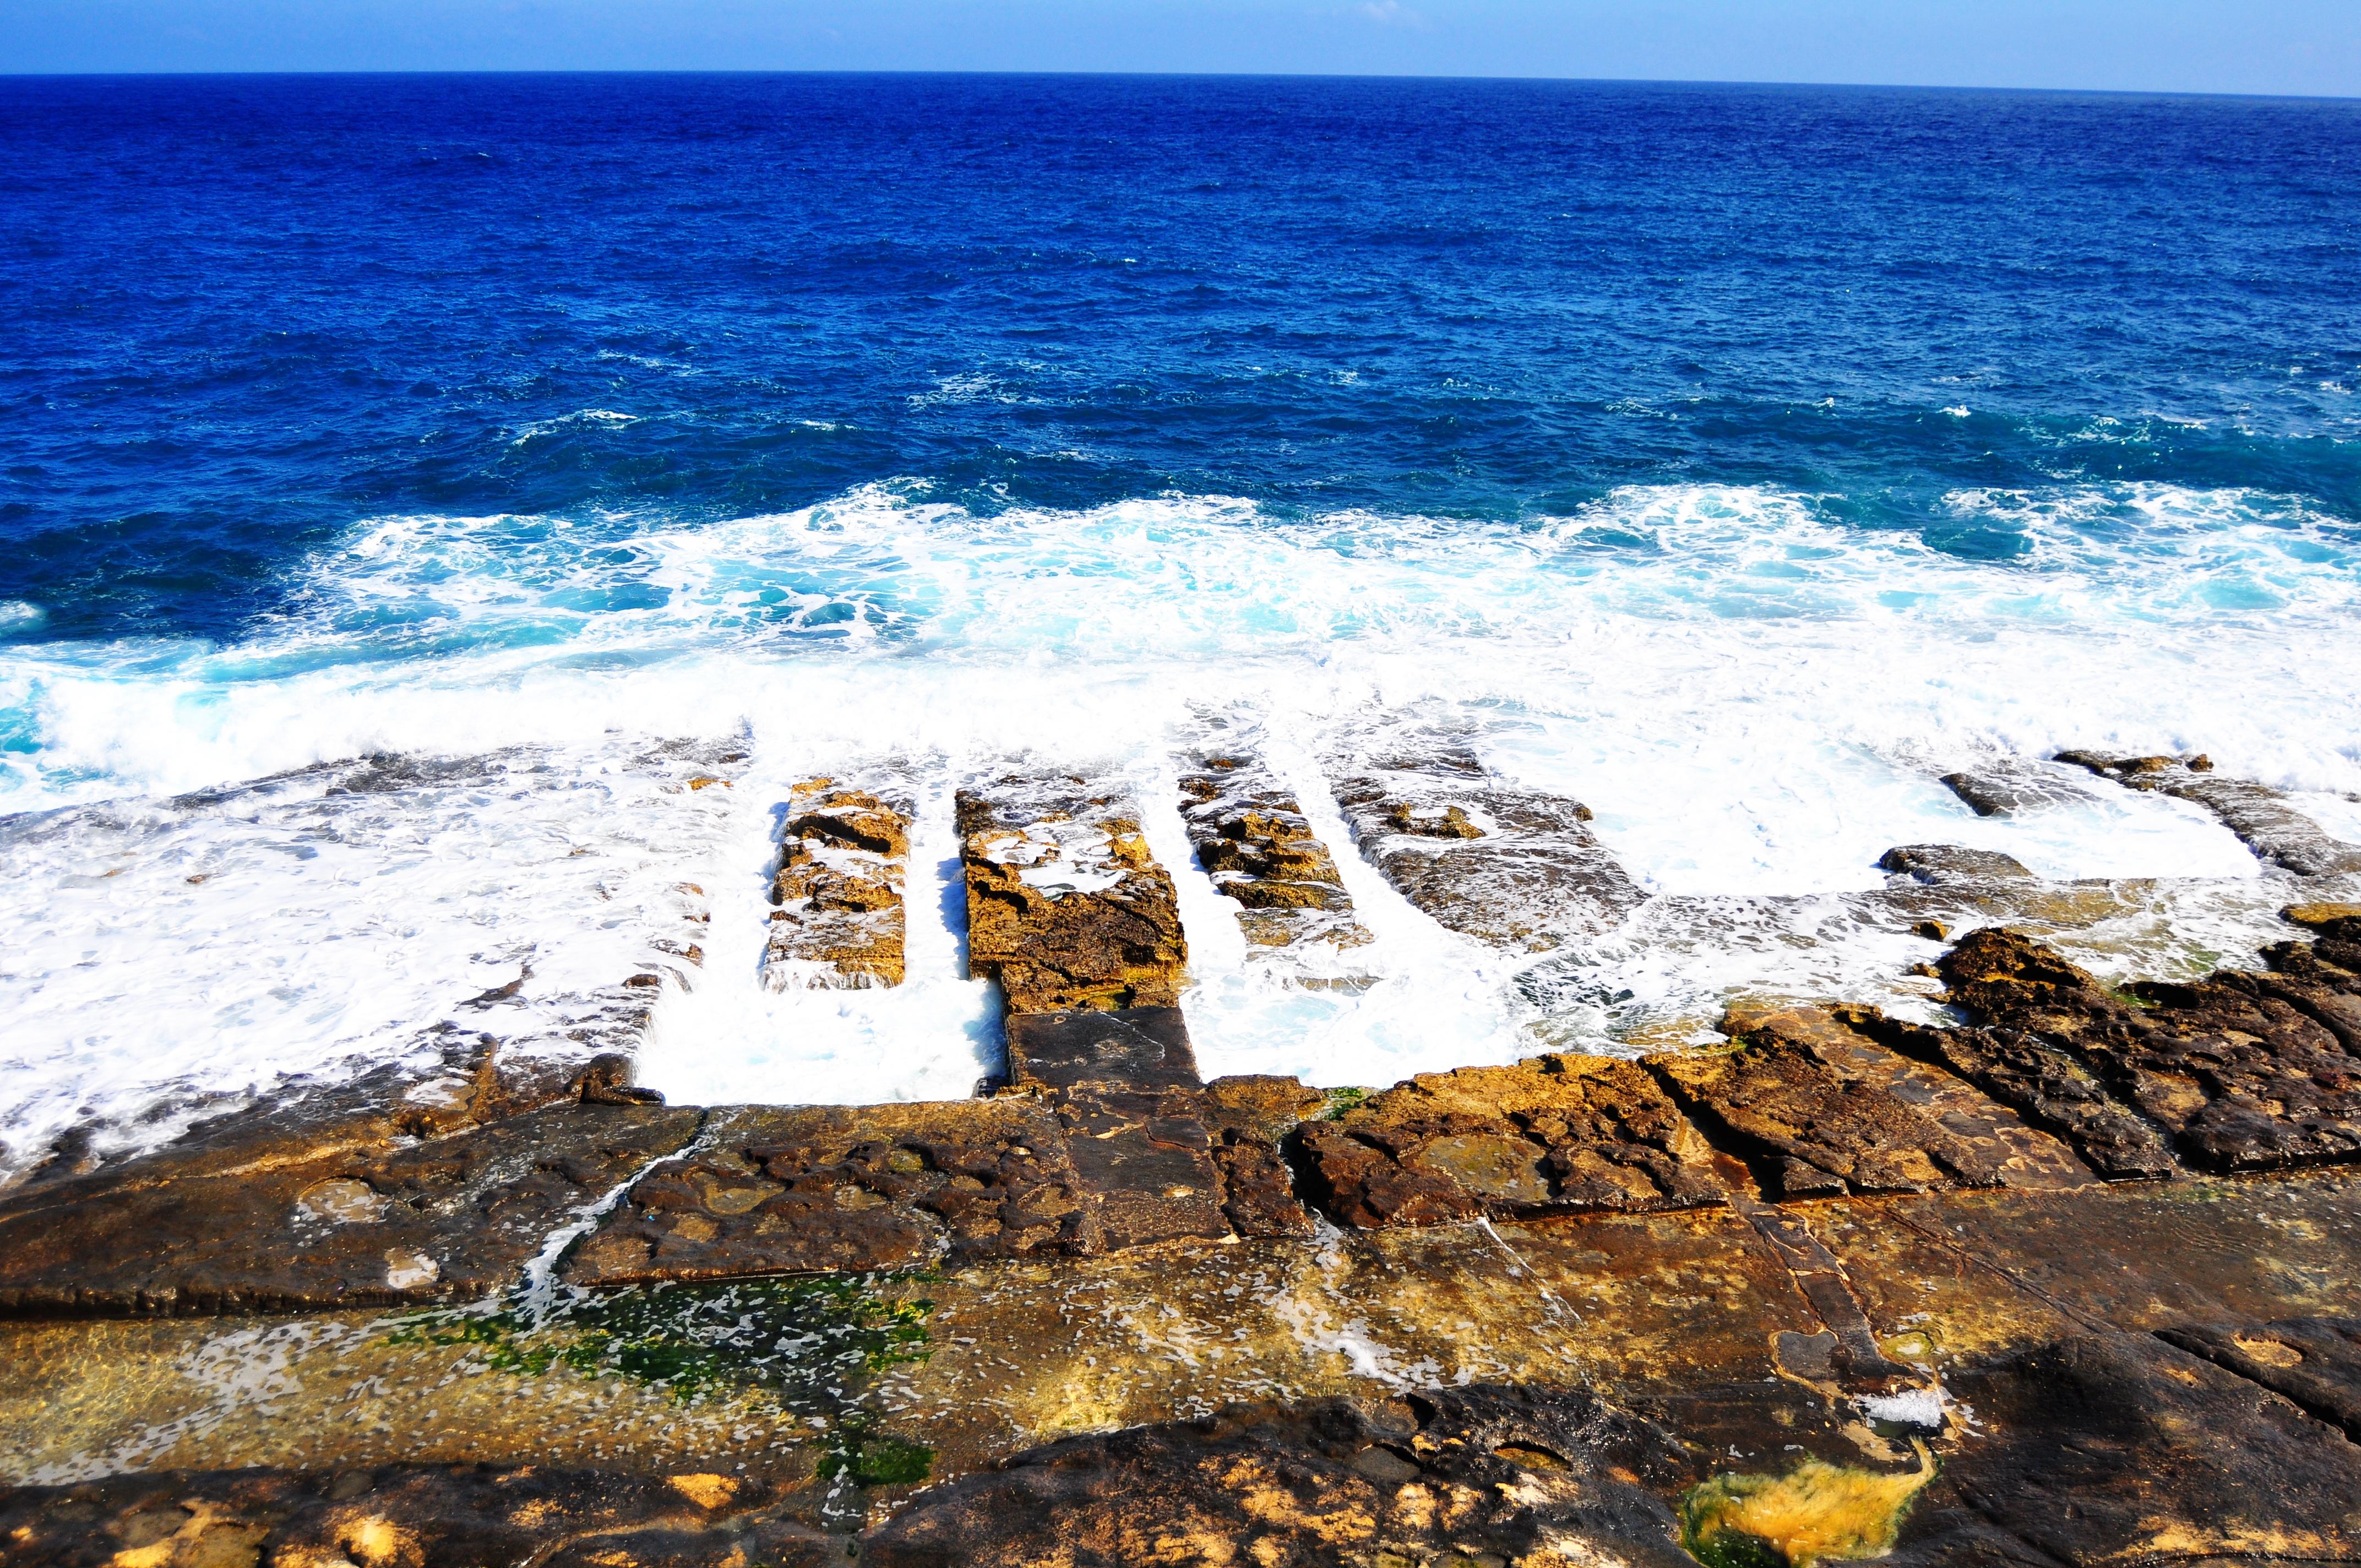 Băile Romane. Sliema. Malta